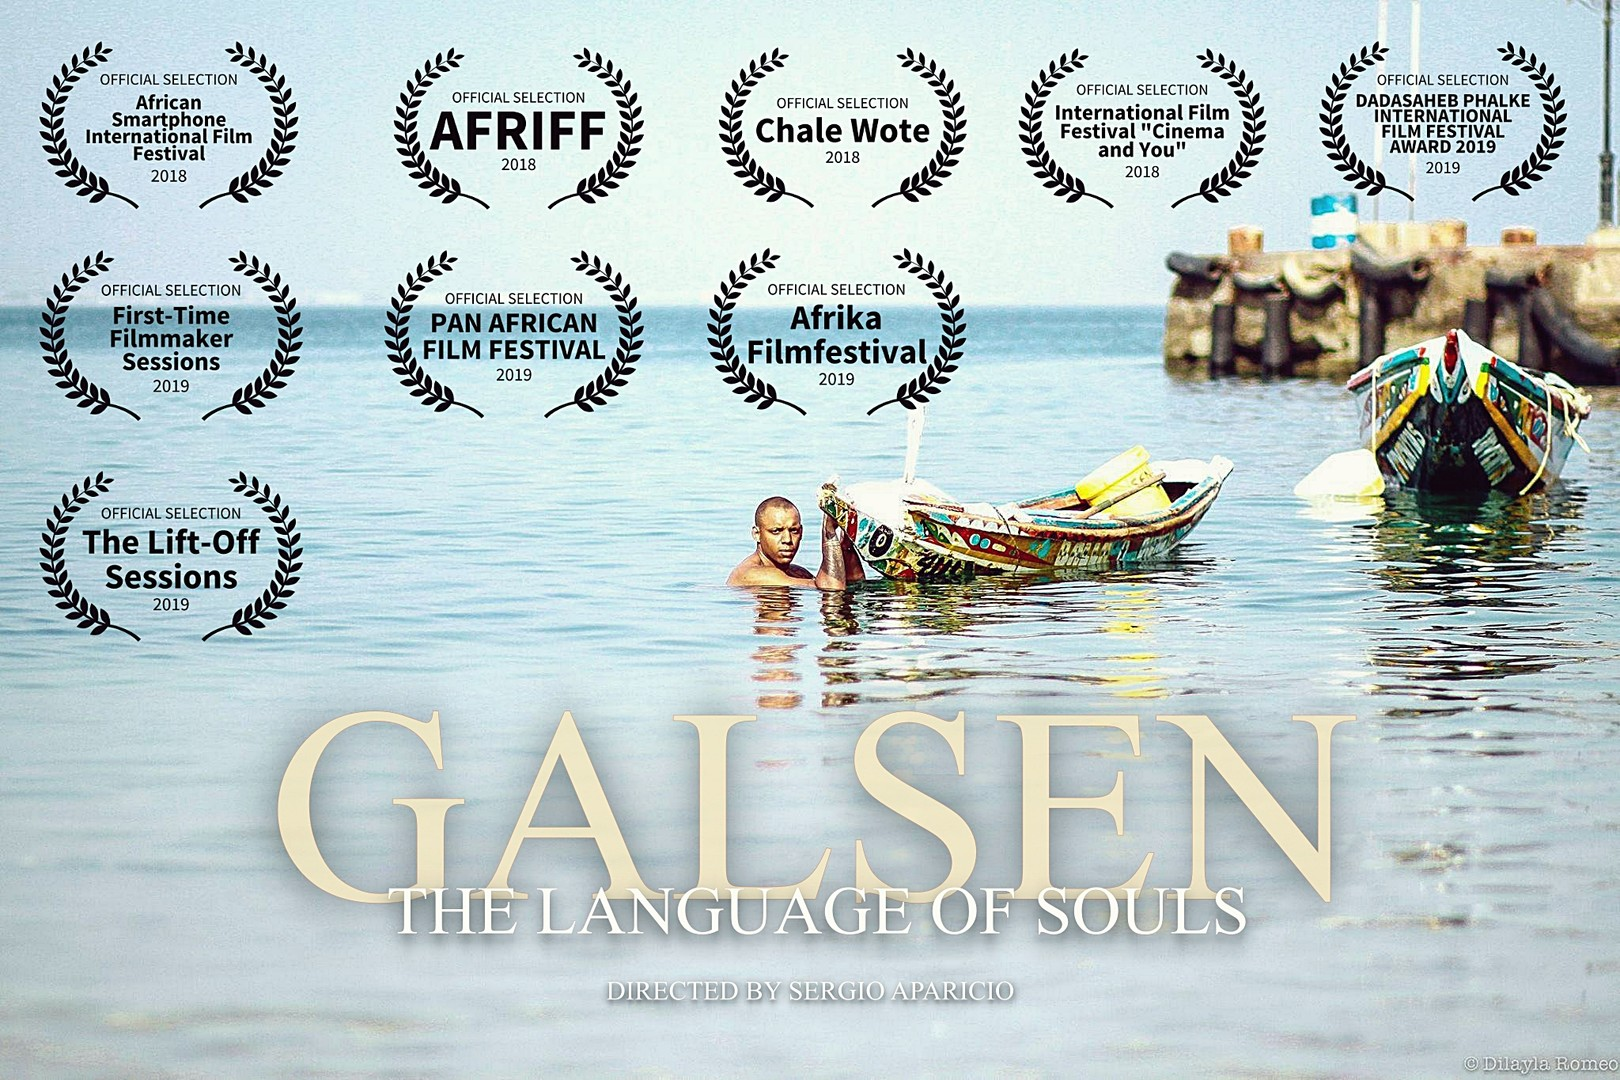 galsen ctff 2019 image